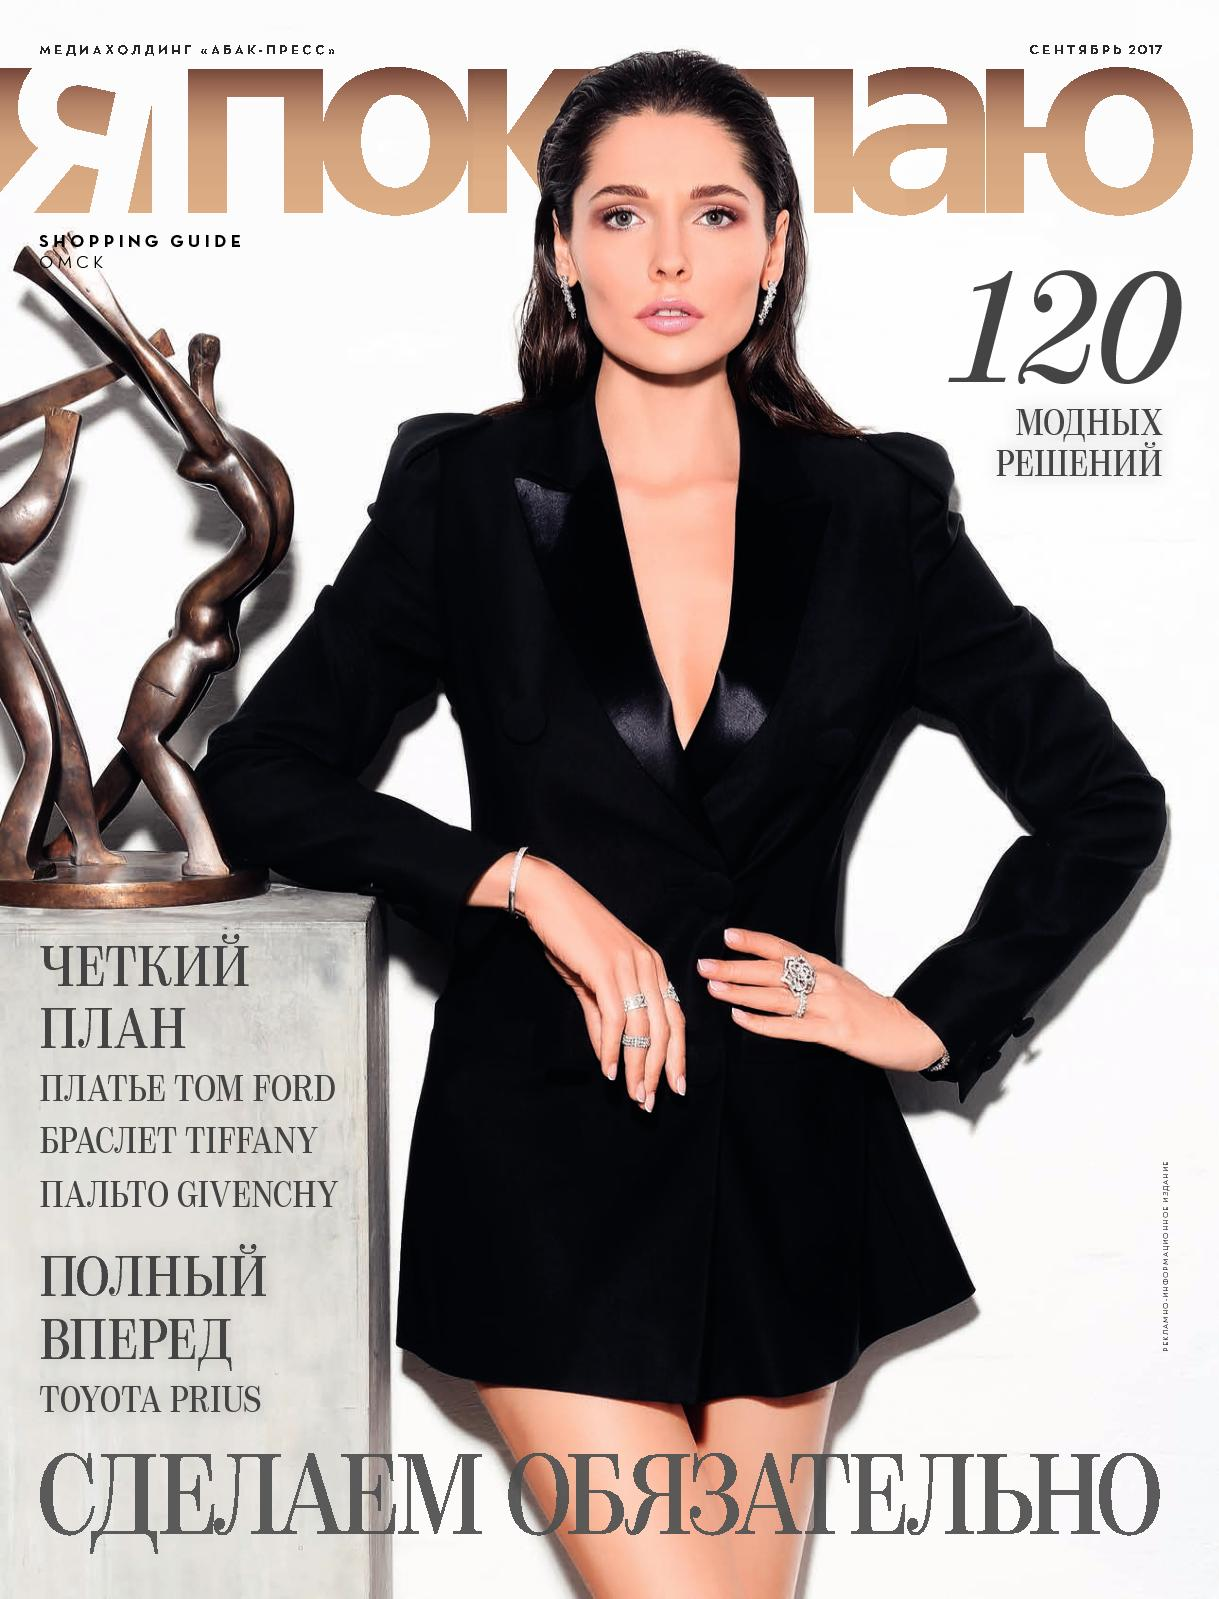 "Shopping Guide ""Я Покупаю. Омск"" сентябрь 2017"